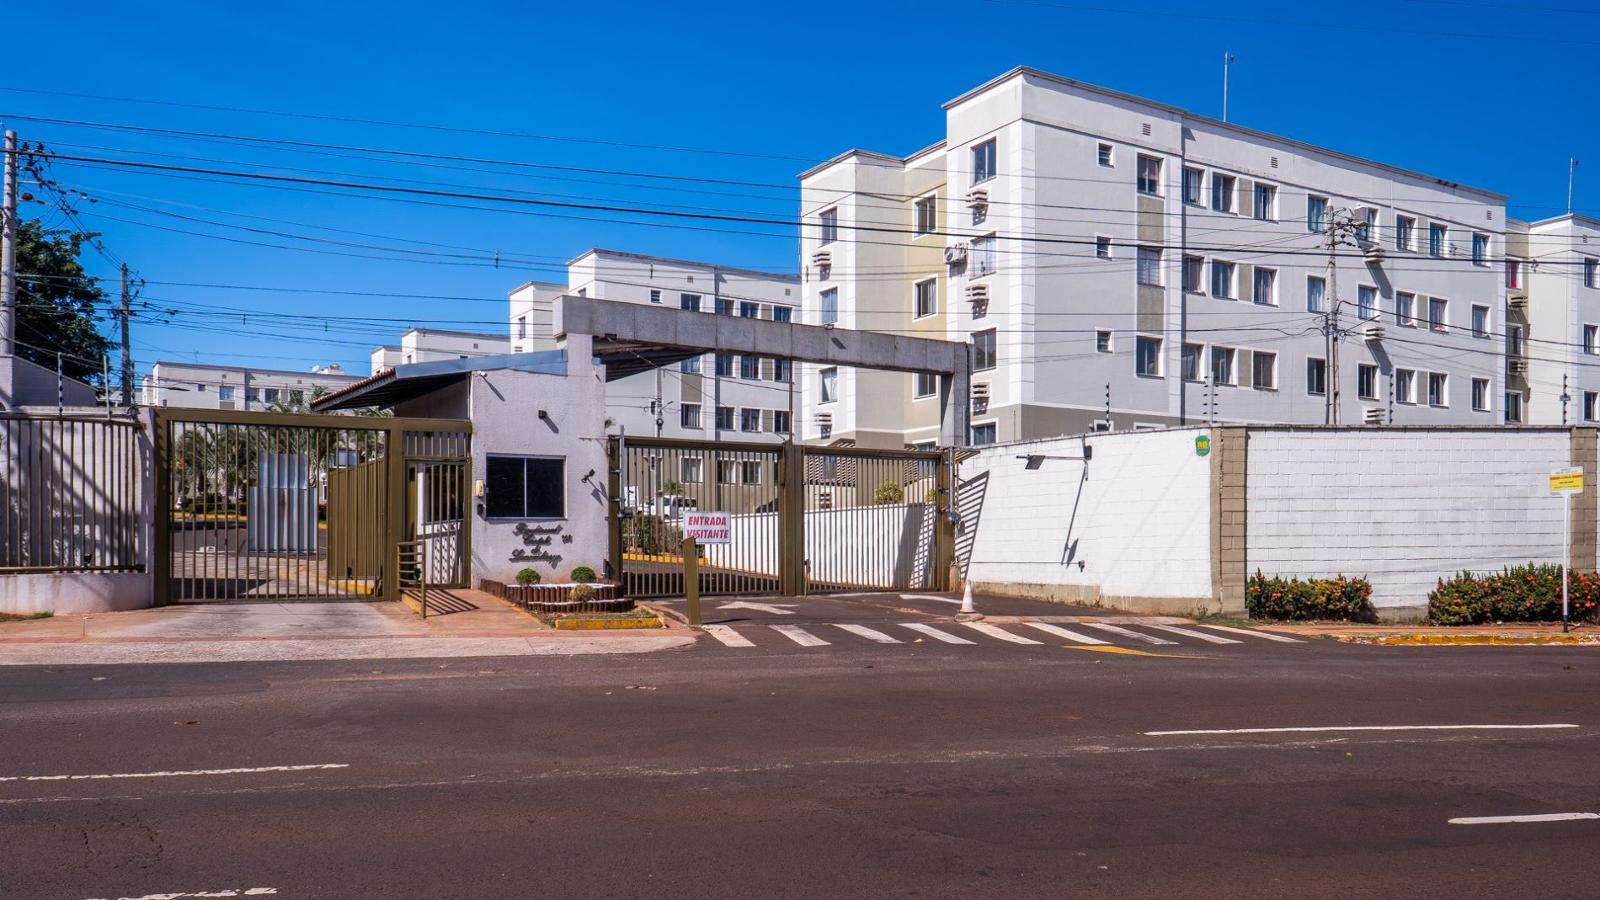 aluguel-campo-grande-ms-apartamento-avenida-senador-antonio-mendes-canale-pioneiros-perez-imoveis